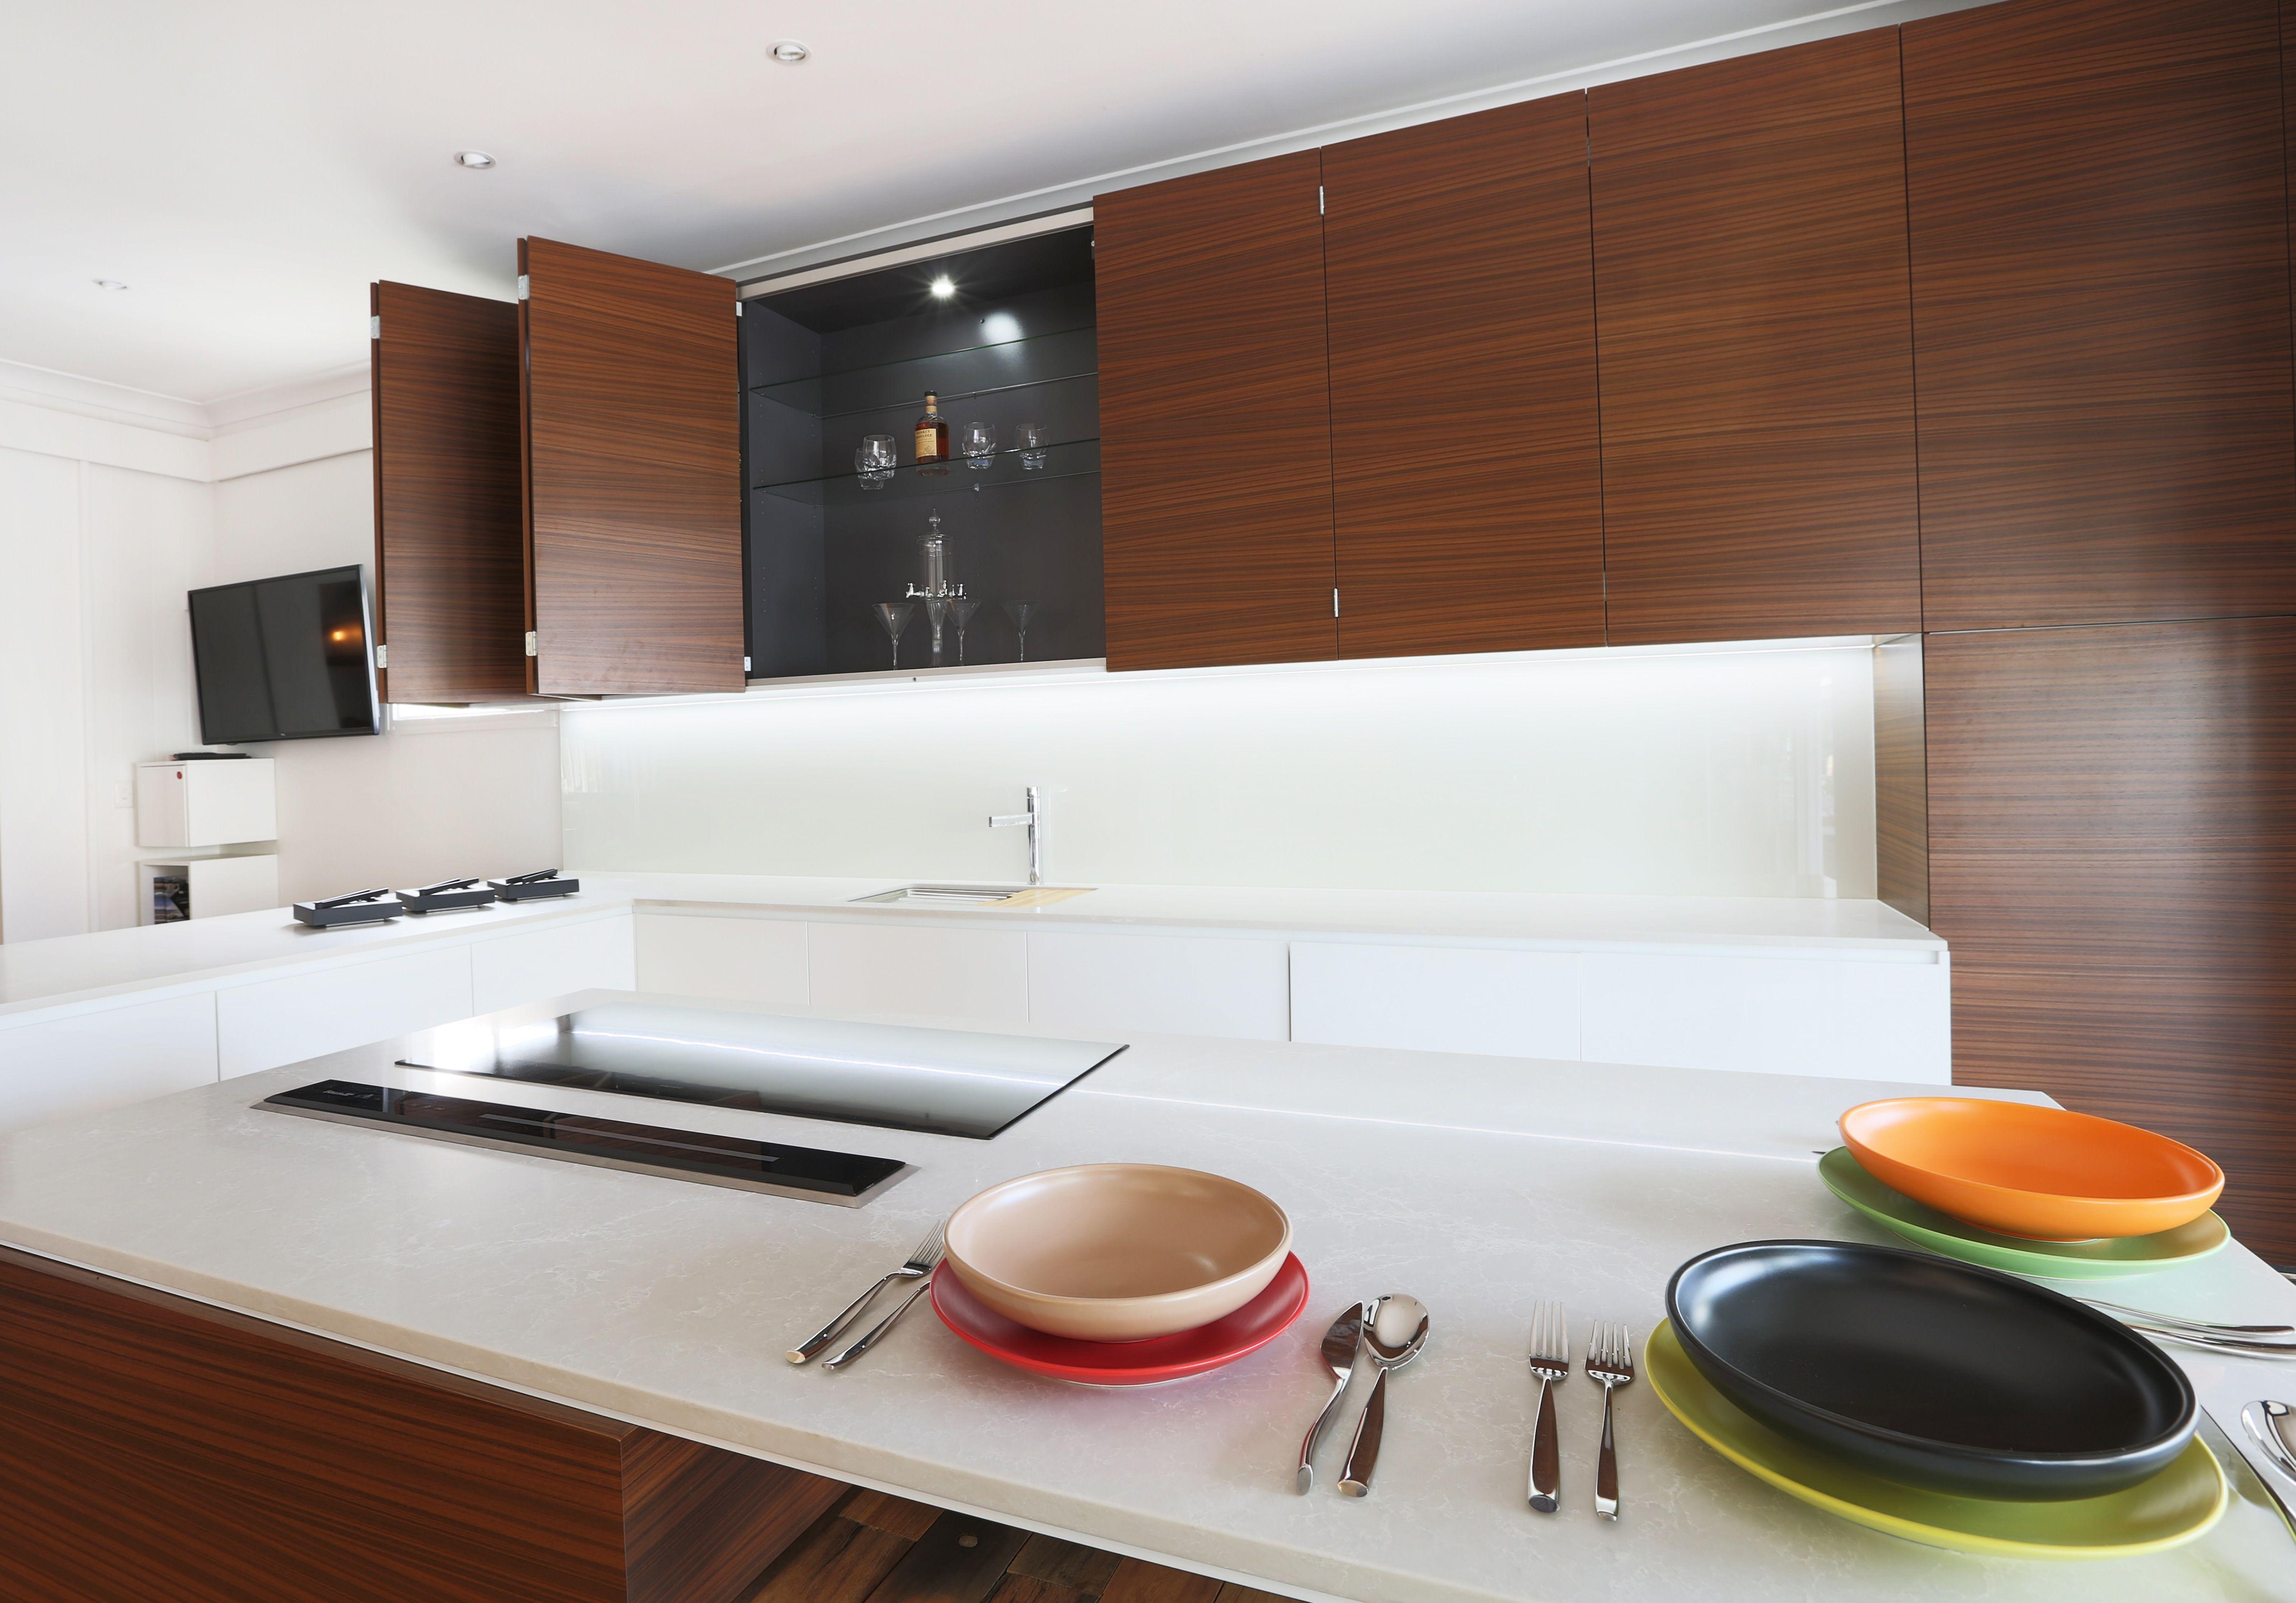 13 best nav | d i s p l a y s images on pinterest | apartments